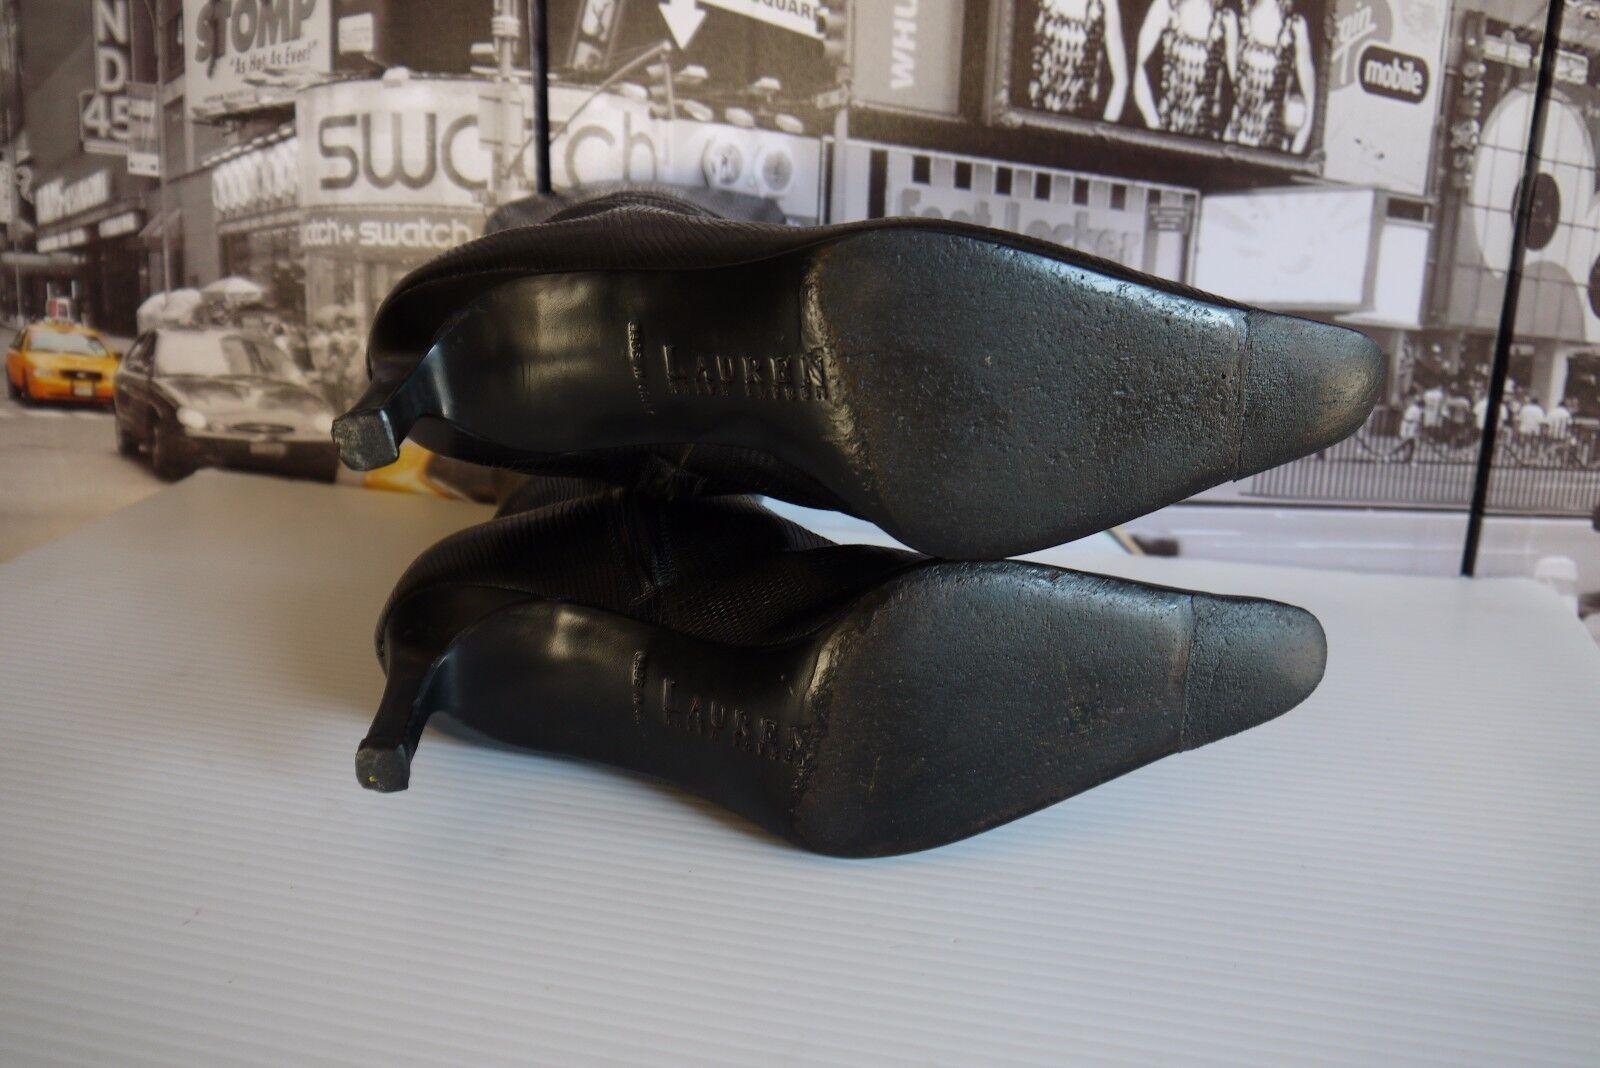 POLO RALPH LEATHER LAUREN Stiefel SNAKESKIN 8 B Damenschuhe schwarz LEATHER RALPH LIZARD ANKLE ITALY 34a473